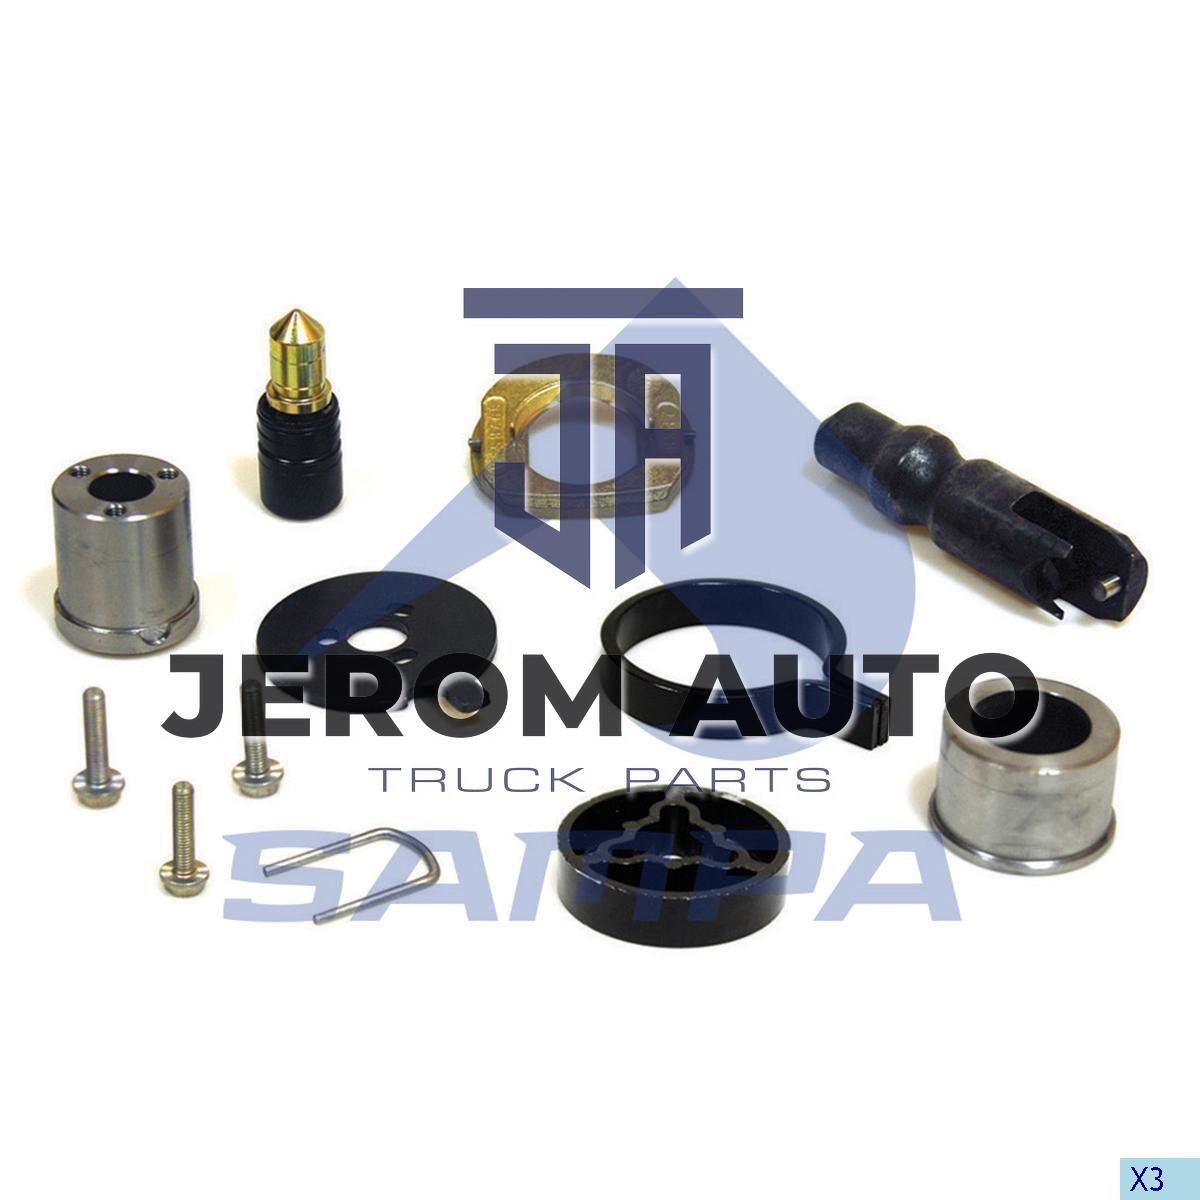 Ремкомплект прицепного устройства (RO400/430/460) (d23/d39xd49,9/d57,9/d30xd38,5x151,5) \ROE71124 \ 095.645